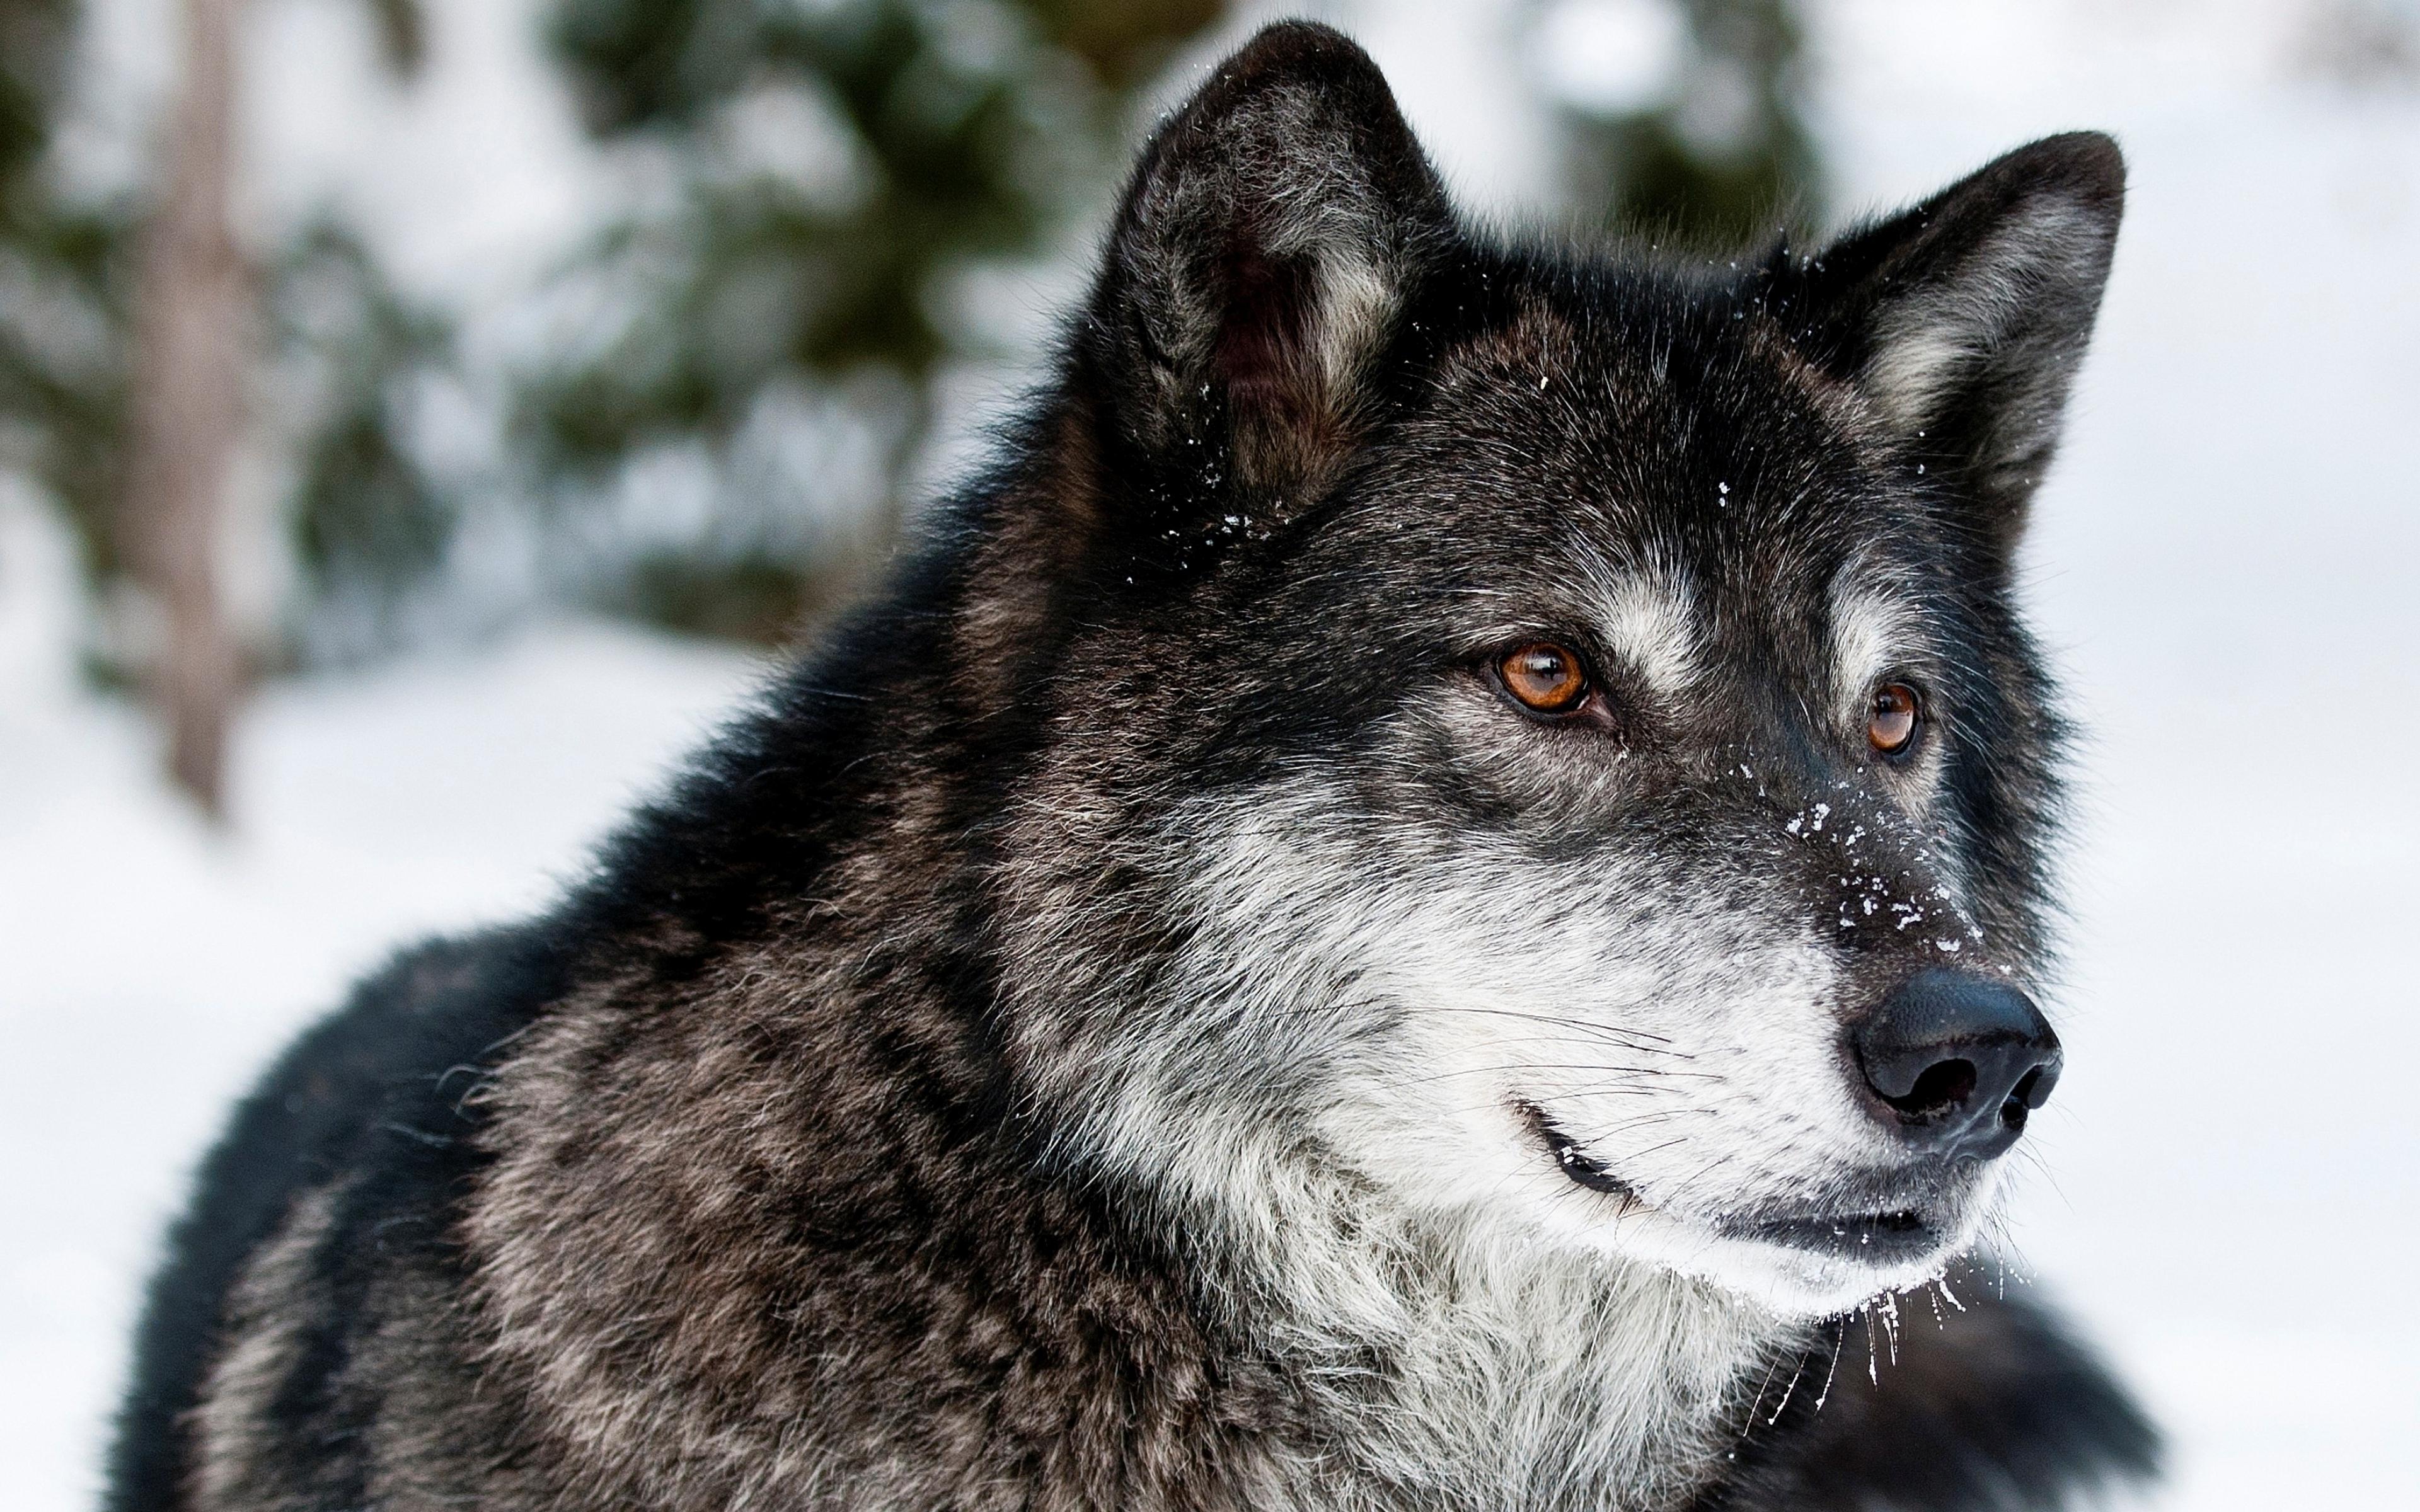 Download Wallpaper 3840x2400 wolf muzzle eyes predator Ultra HD 4K 3840x2400